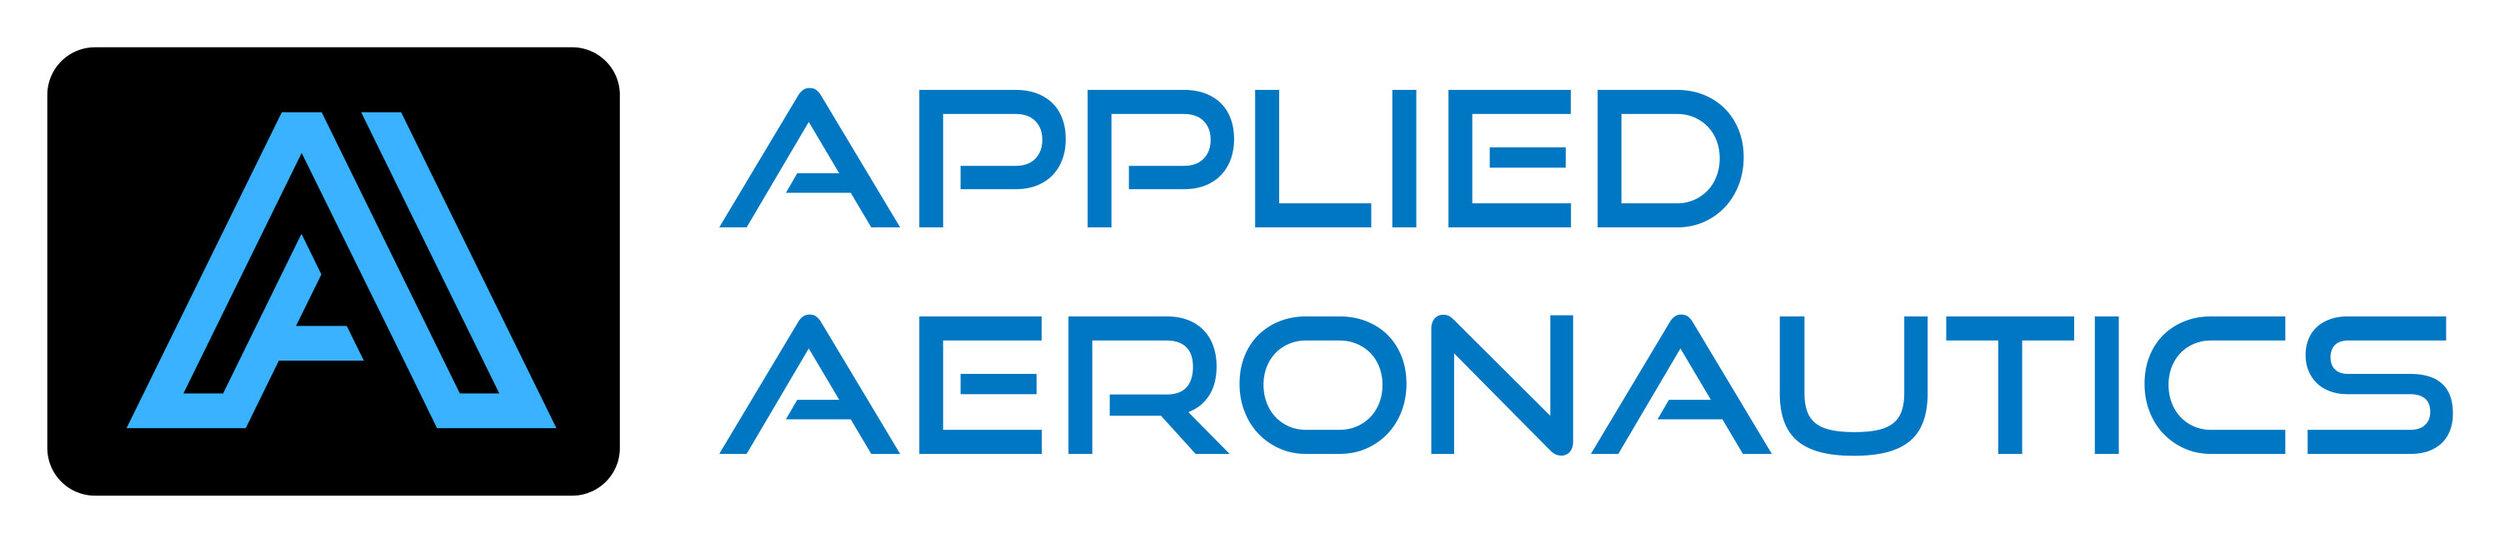 Applied-Aeronautics-Logo-JPG.jpg